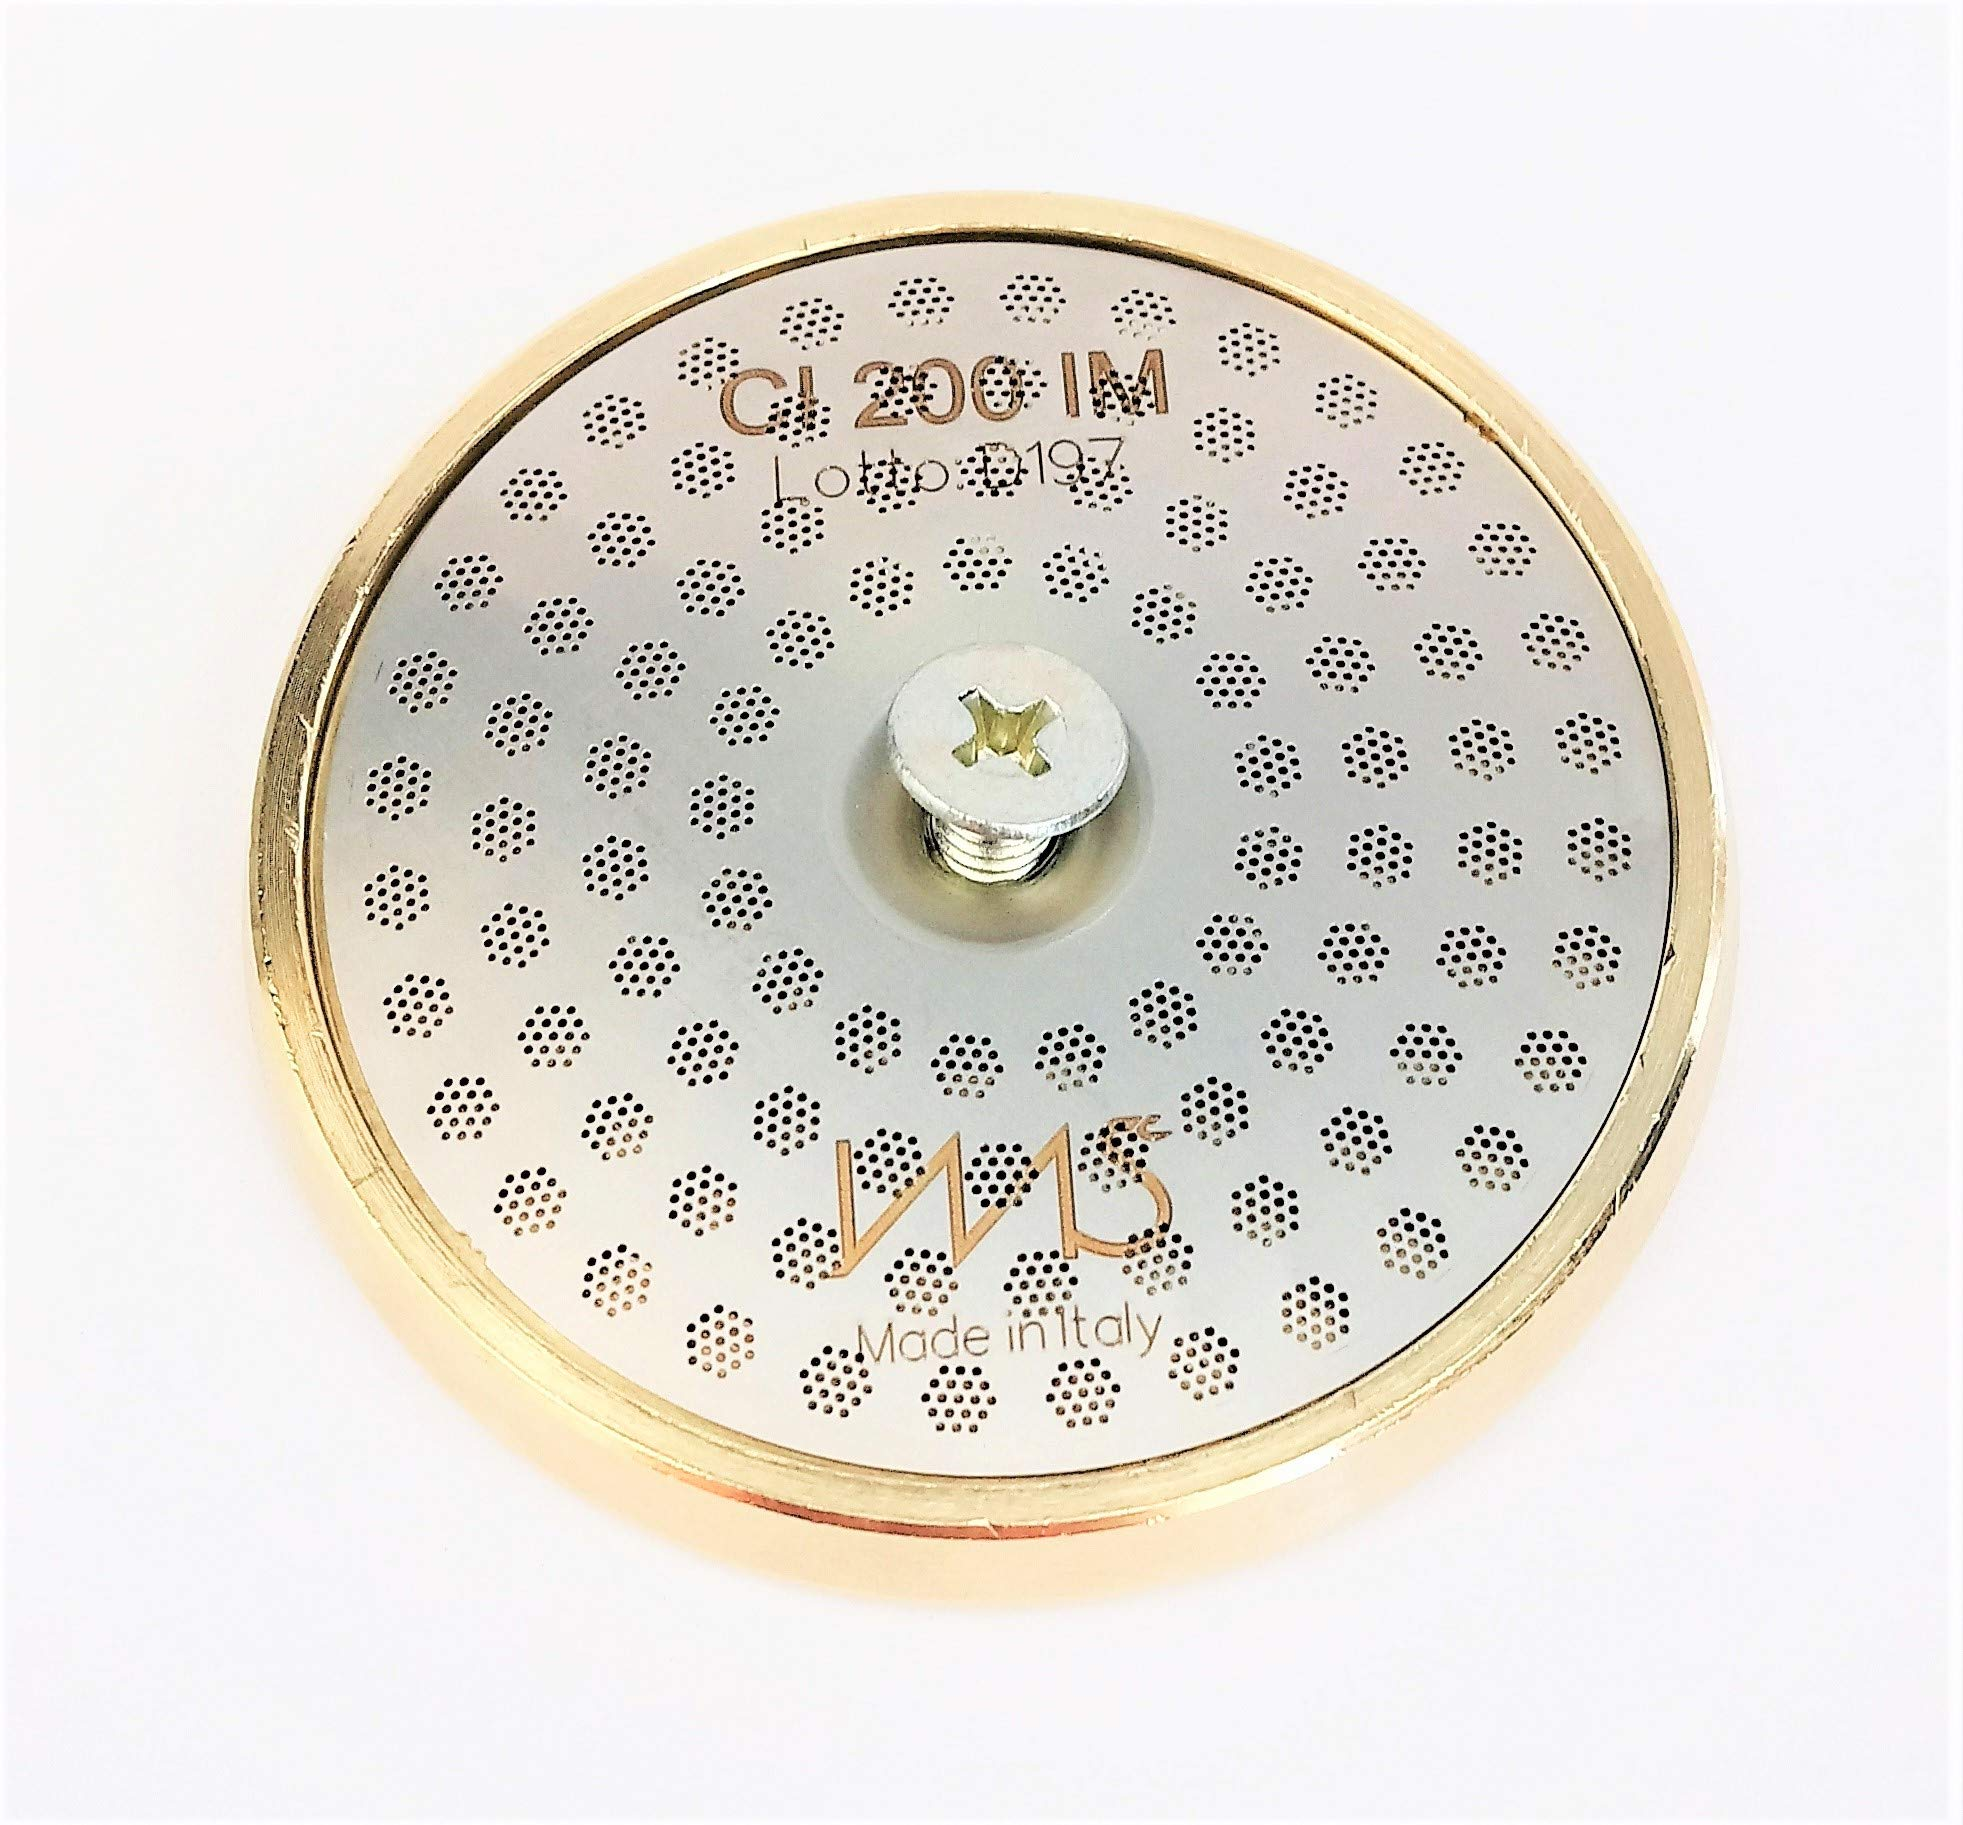 Breville shower screen and inner holder. Custom tune up kit for 58mm Breville BES900XL BES920XL BES980XL. IMS Precision Shower Screen and Brass inner holder by VeryBarista (Image #1)